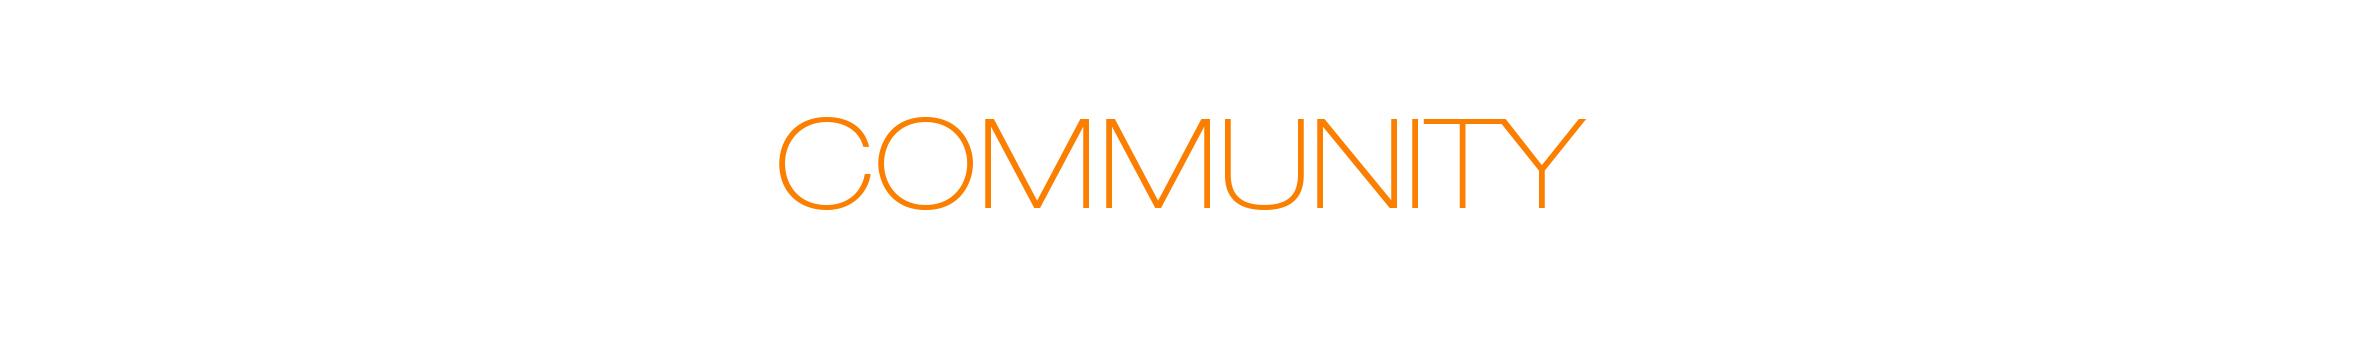 Comm - 1 - Title.jpg